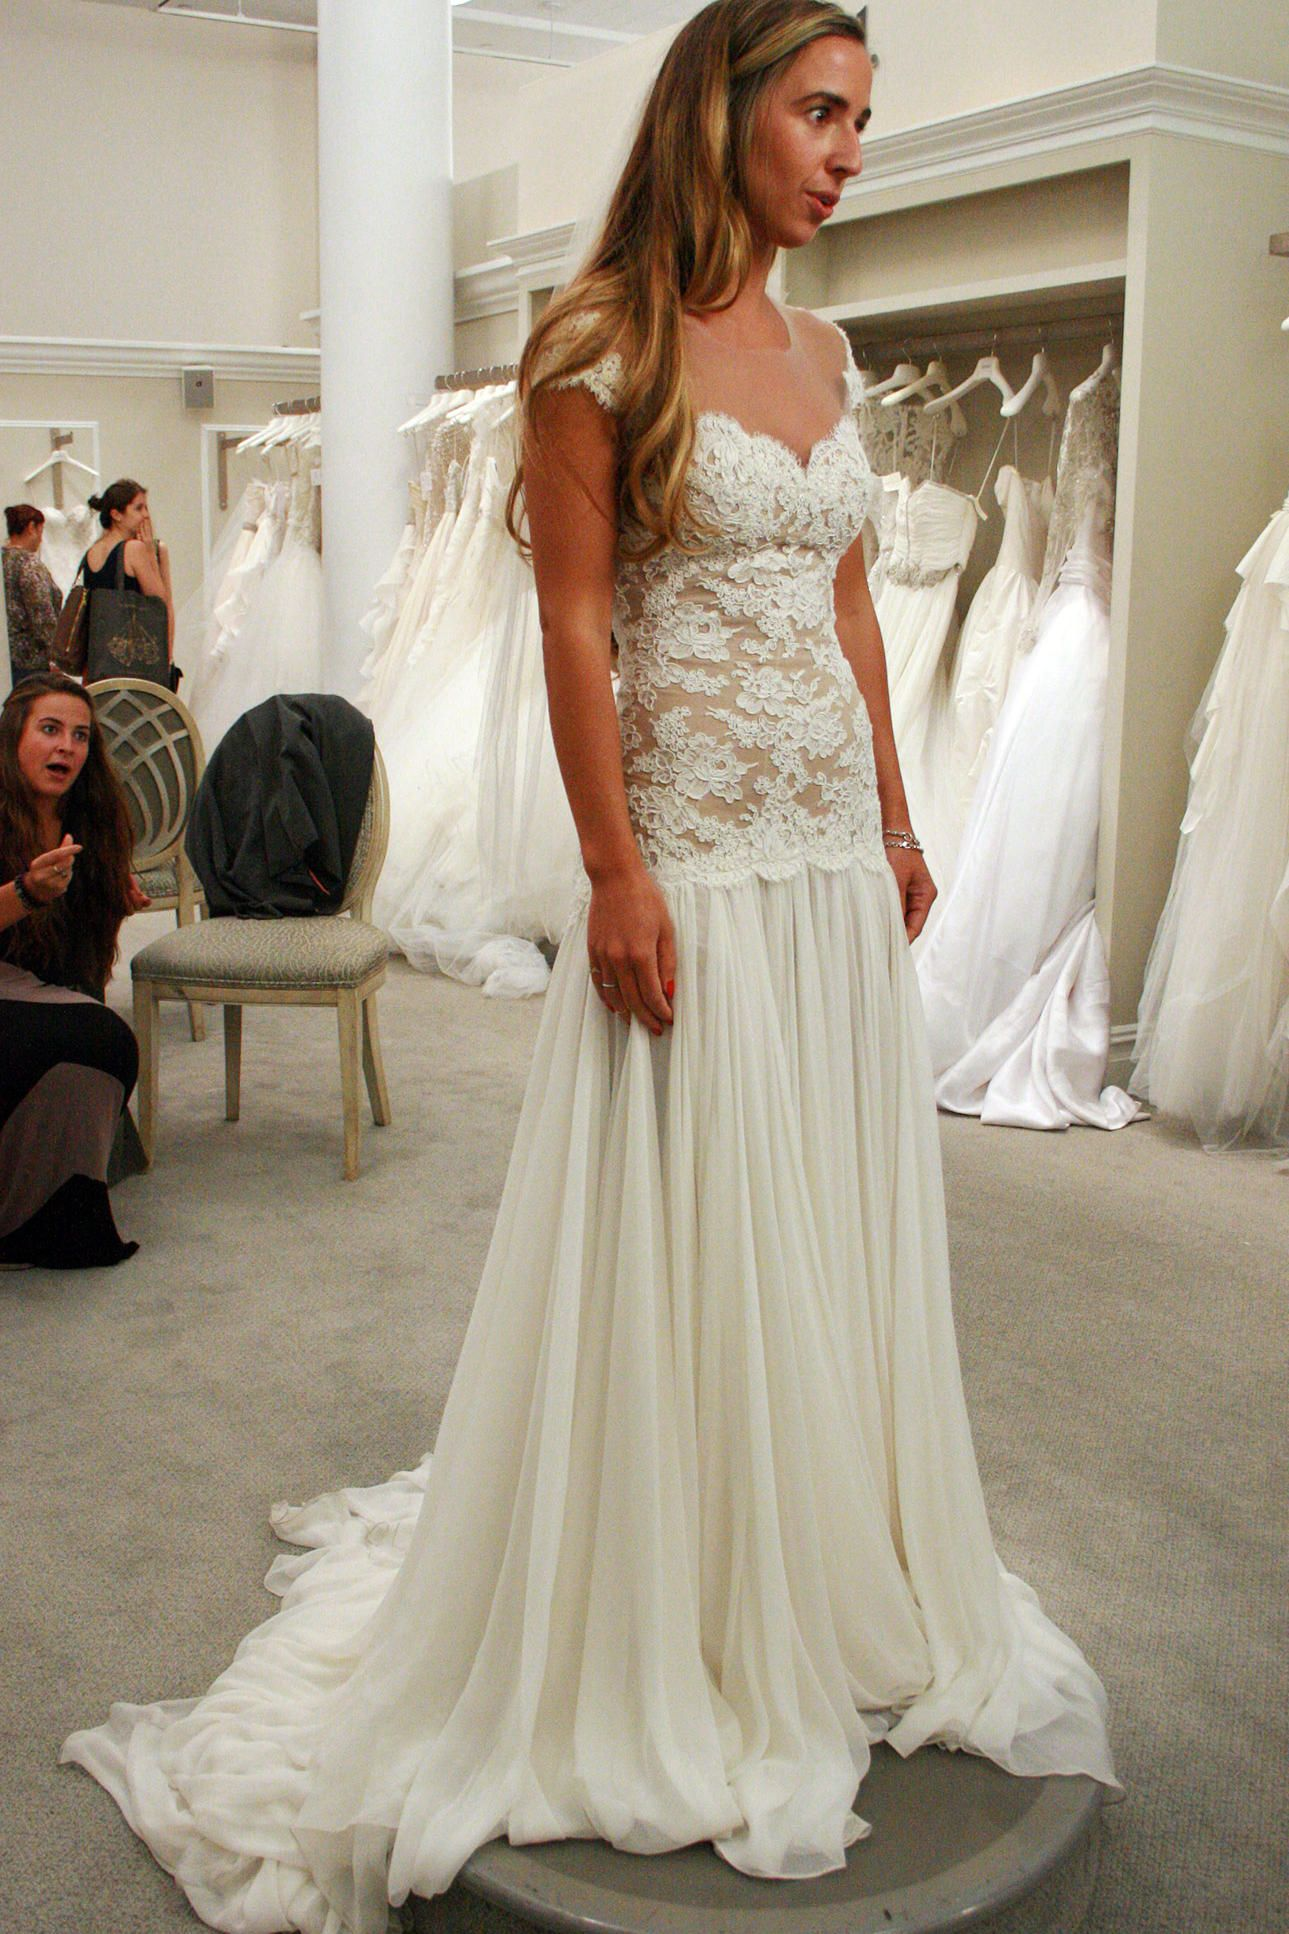 Samantha white wedding dress pinterest dress picture short